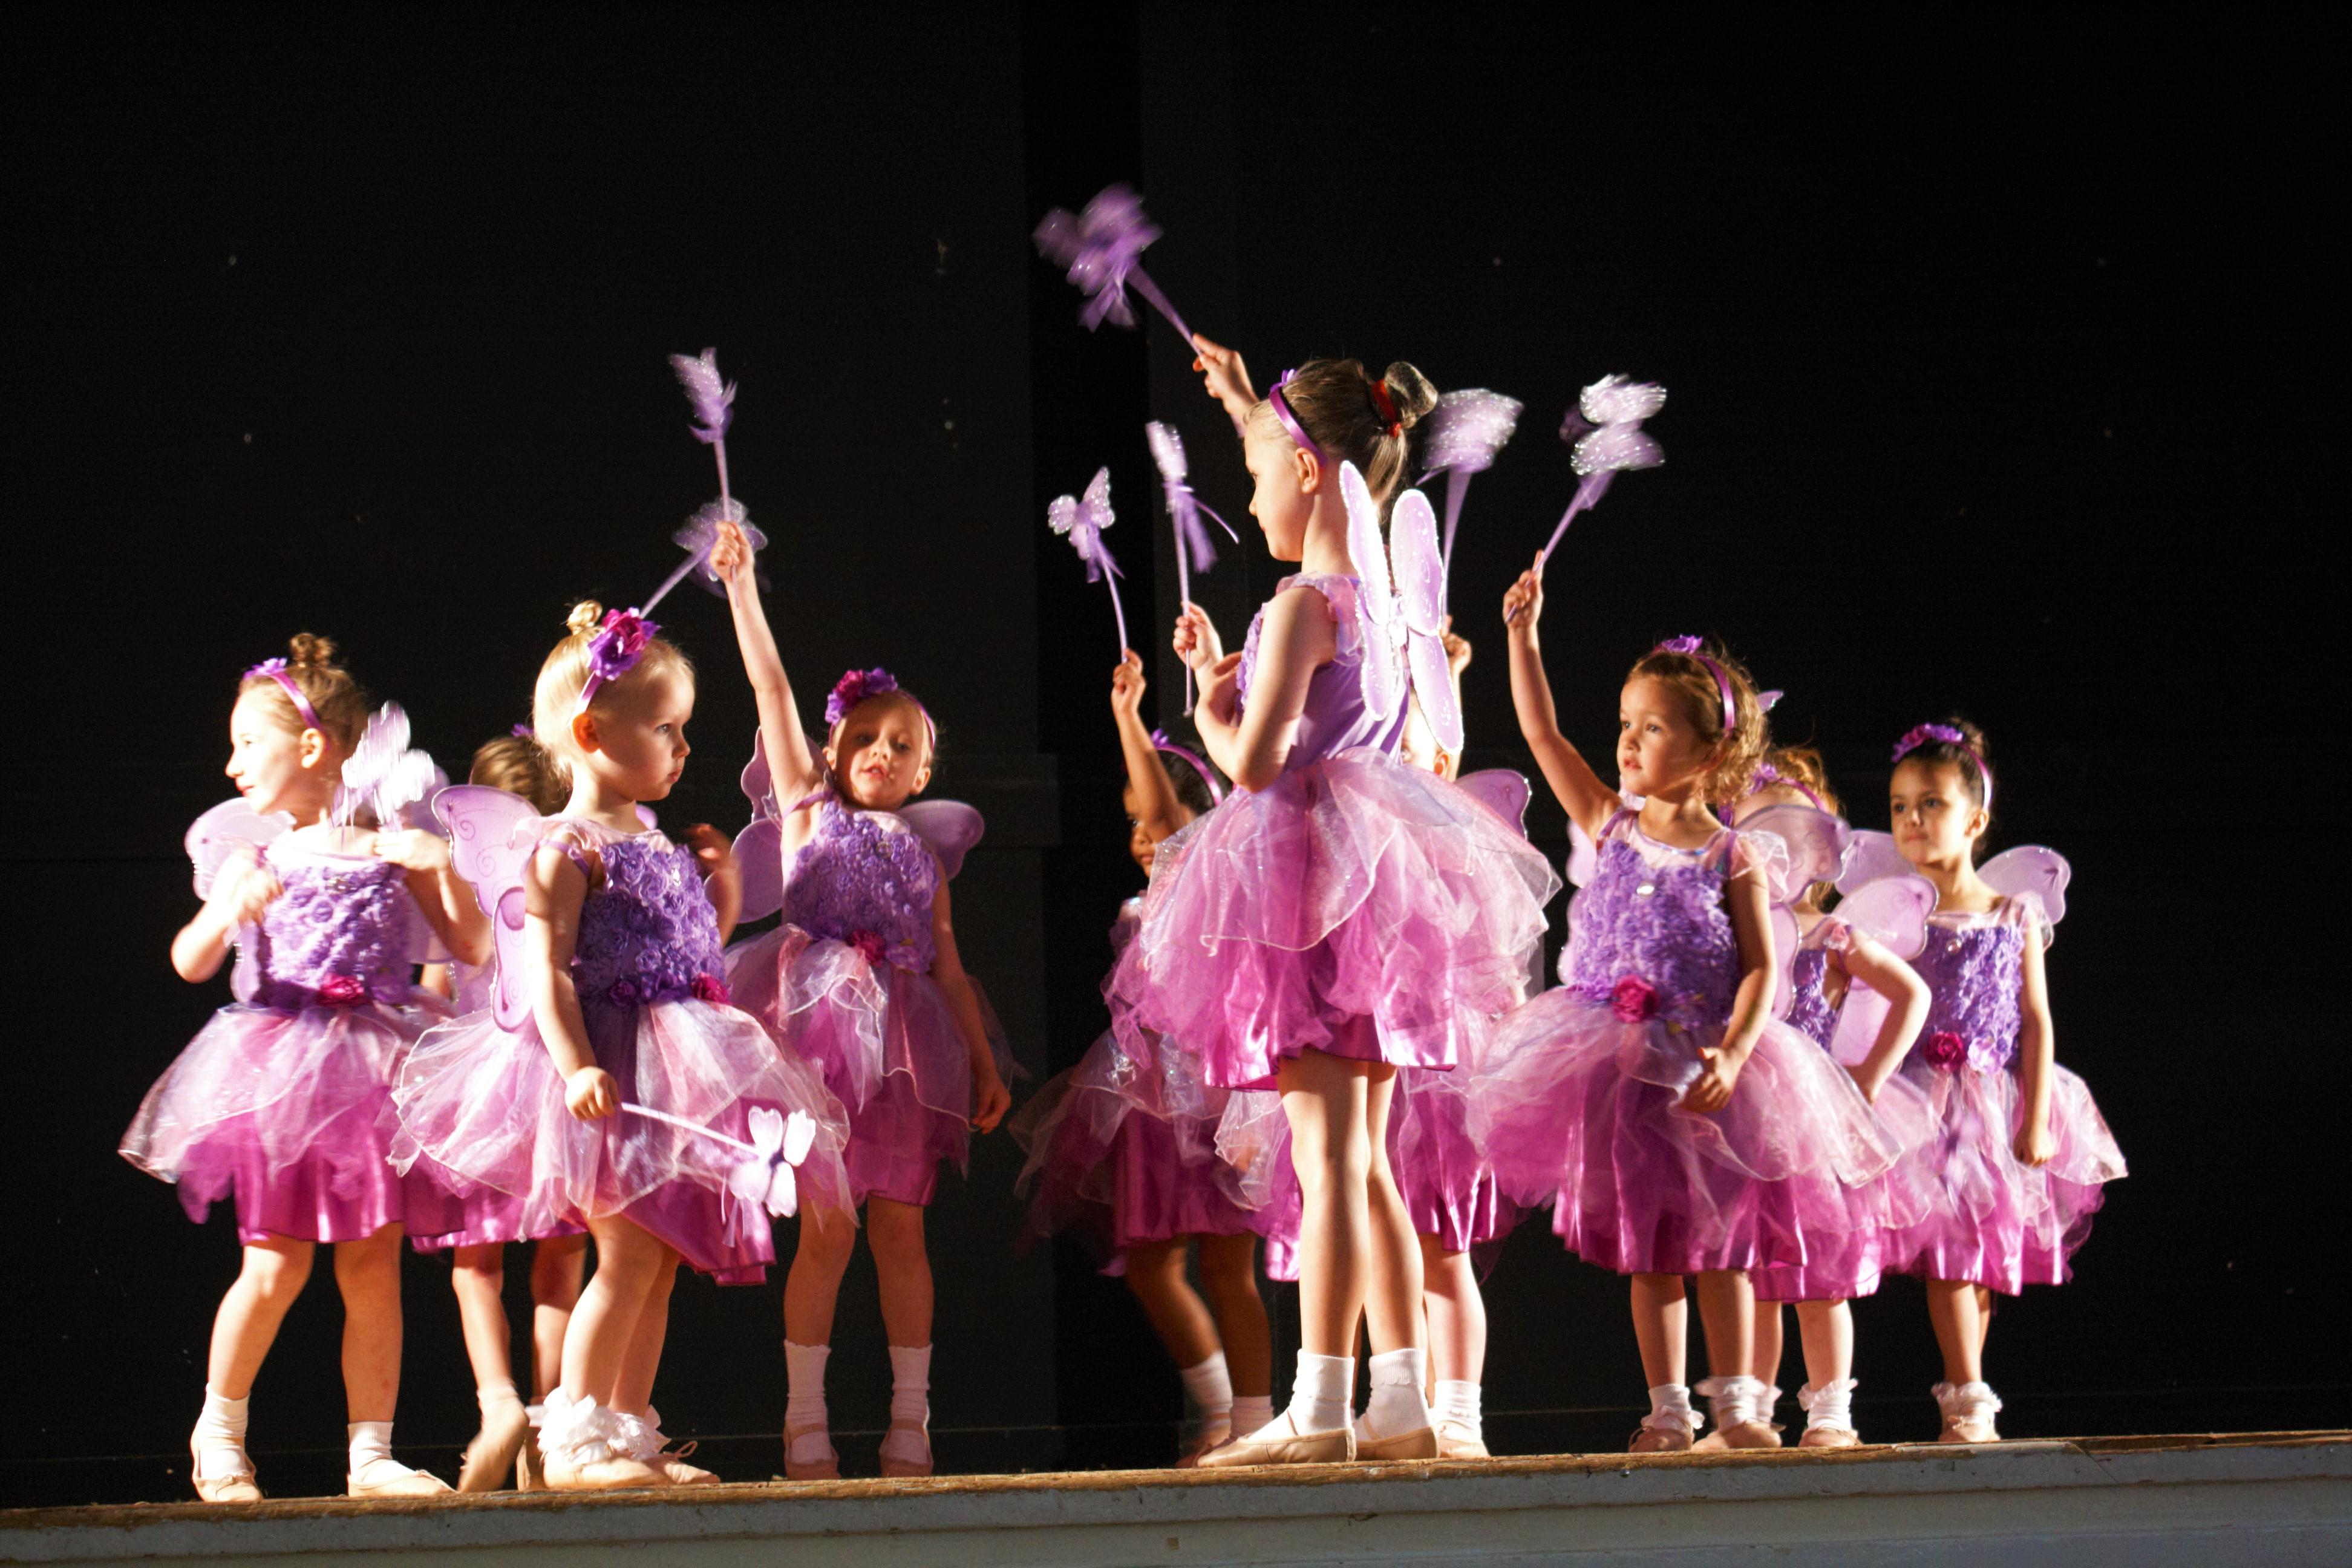 Ballerinas dressed as fairies